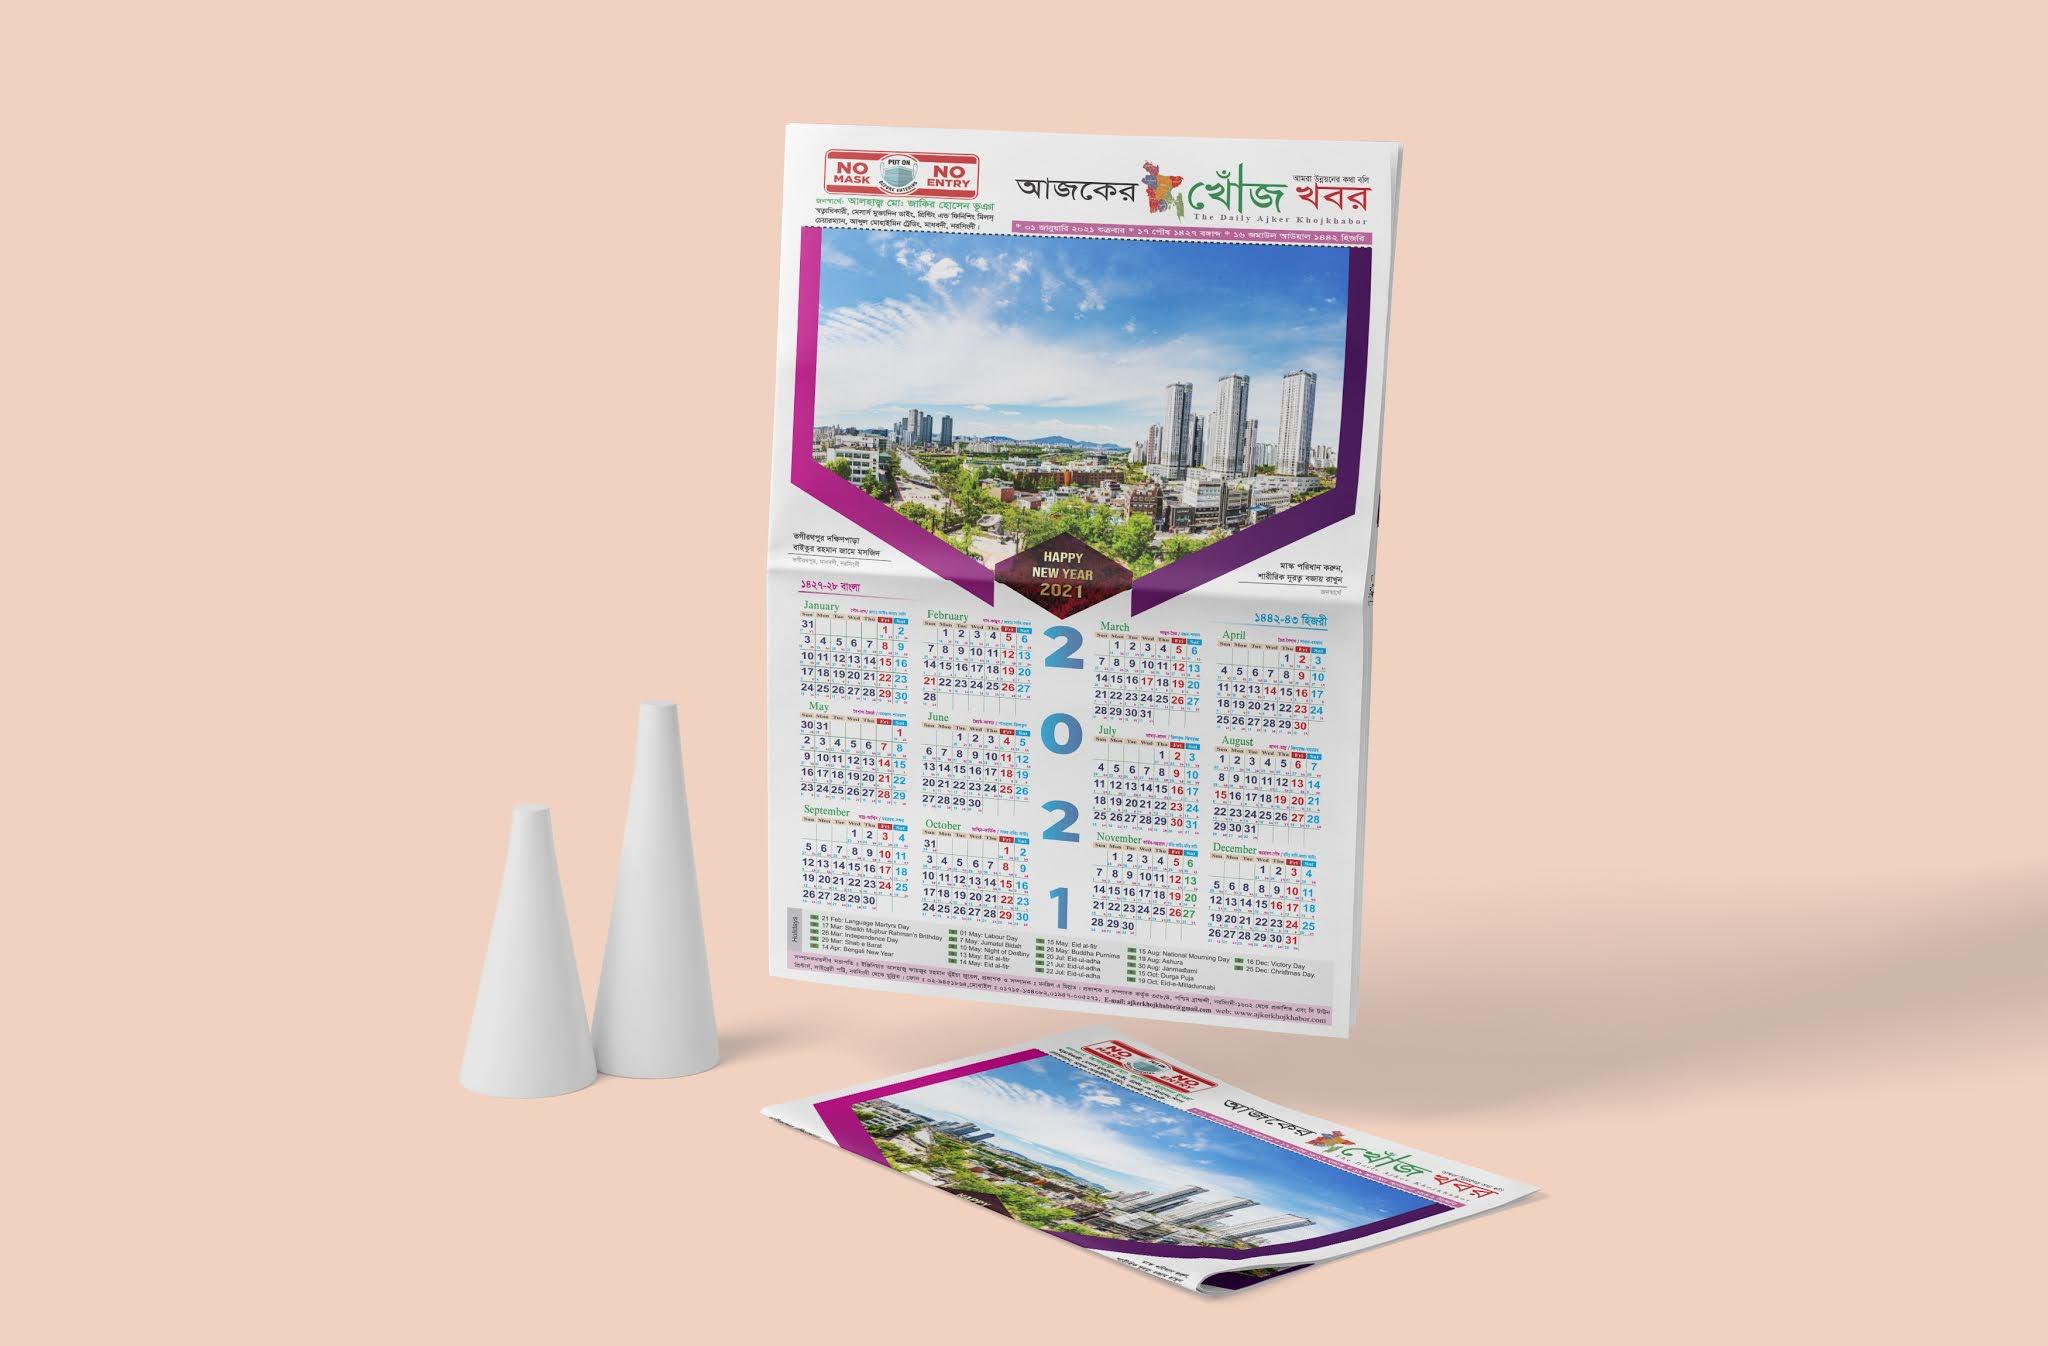 Calendar design 2021 | English, Bangla & Hijri Calendar | Bangla Calendar | Hijri Calendar | ক্যালেন্ডার ডিজাইন 2021 | বাংলা, ইংরেজী ও হিজরী দিনপঞ্জি